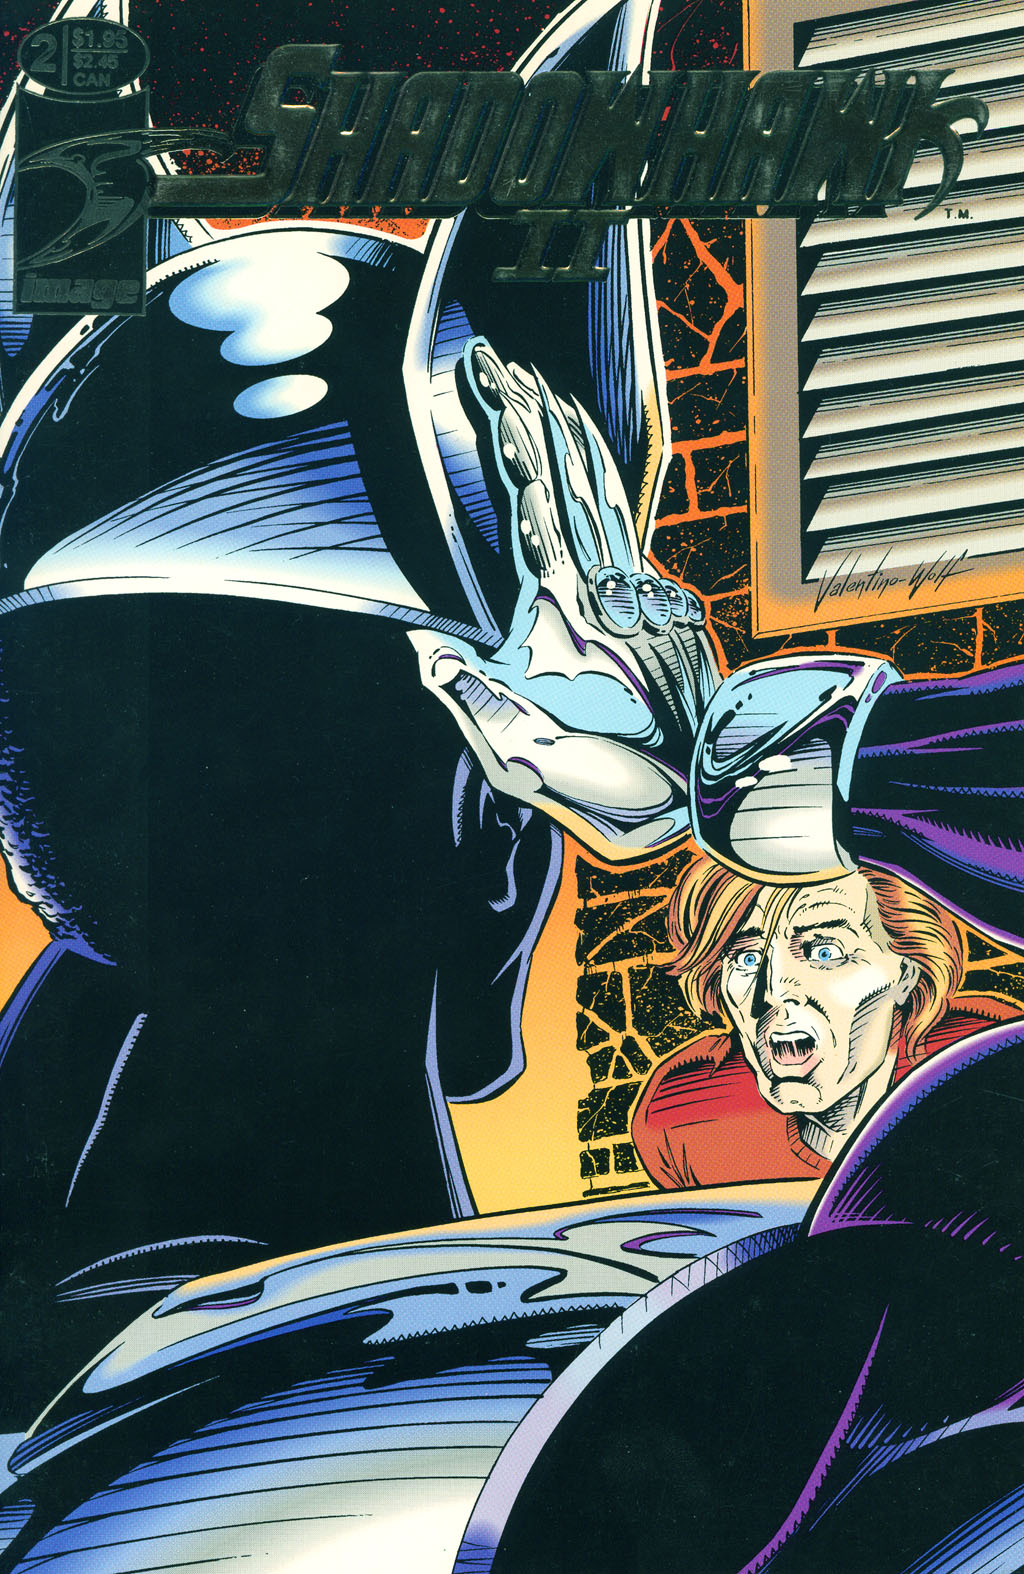 Read online ShadowHawk comic -  Issue #6 - 2